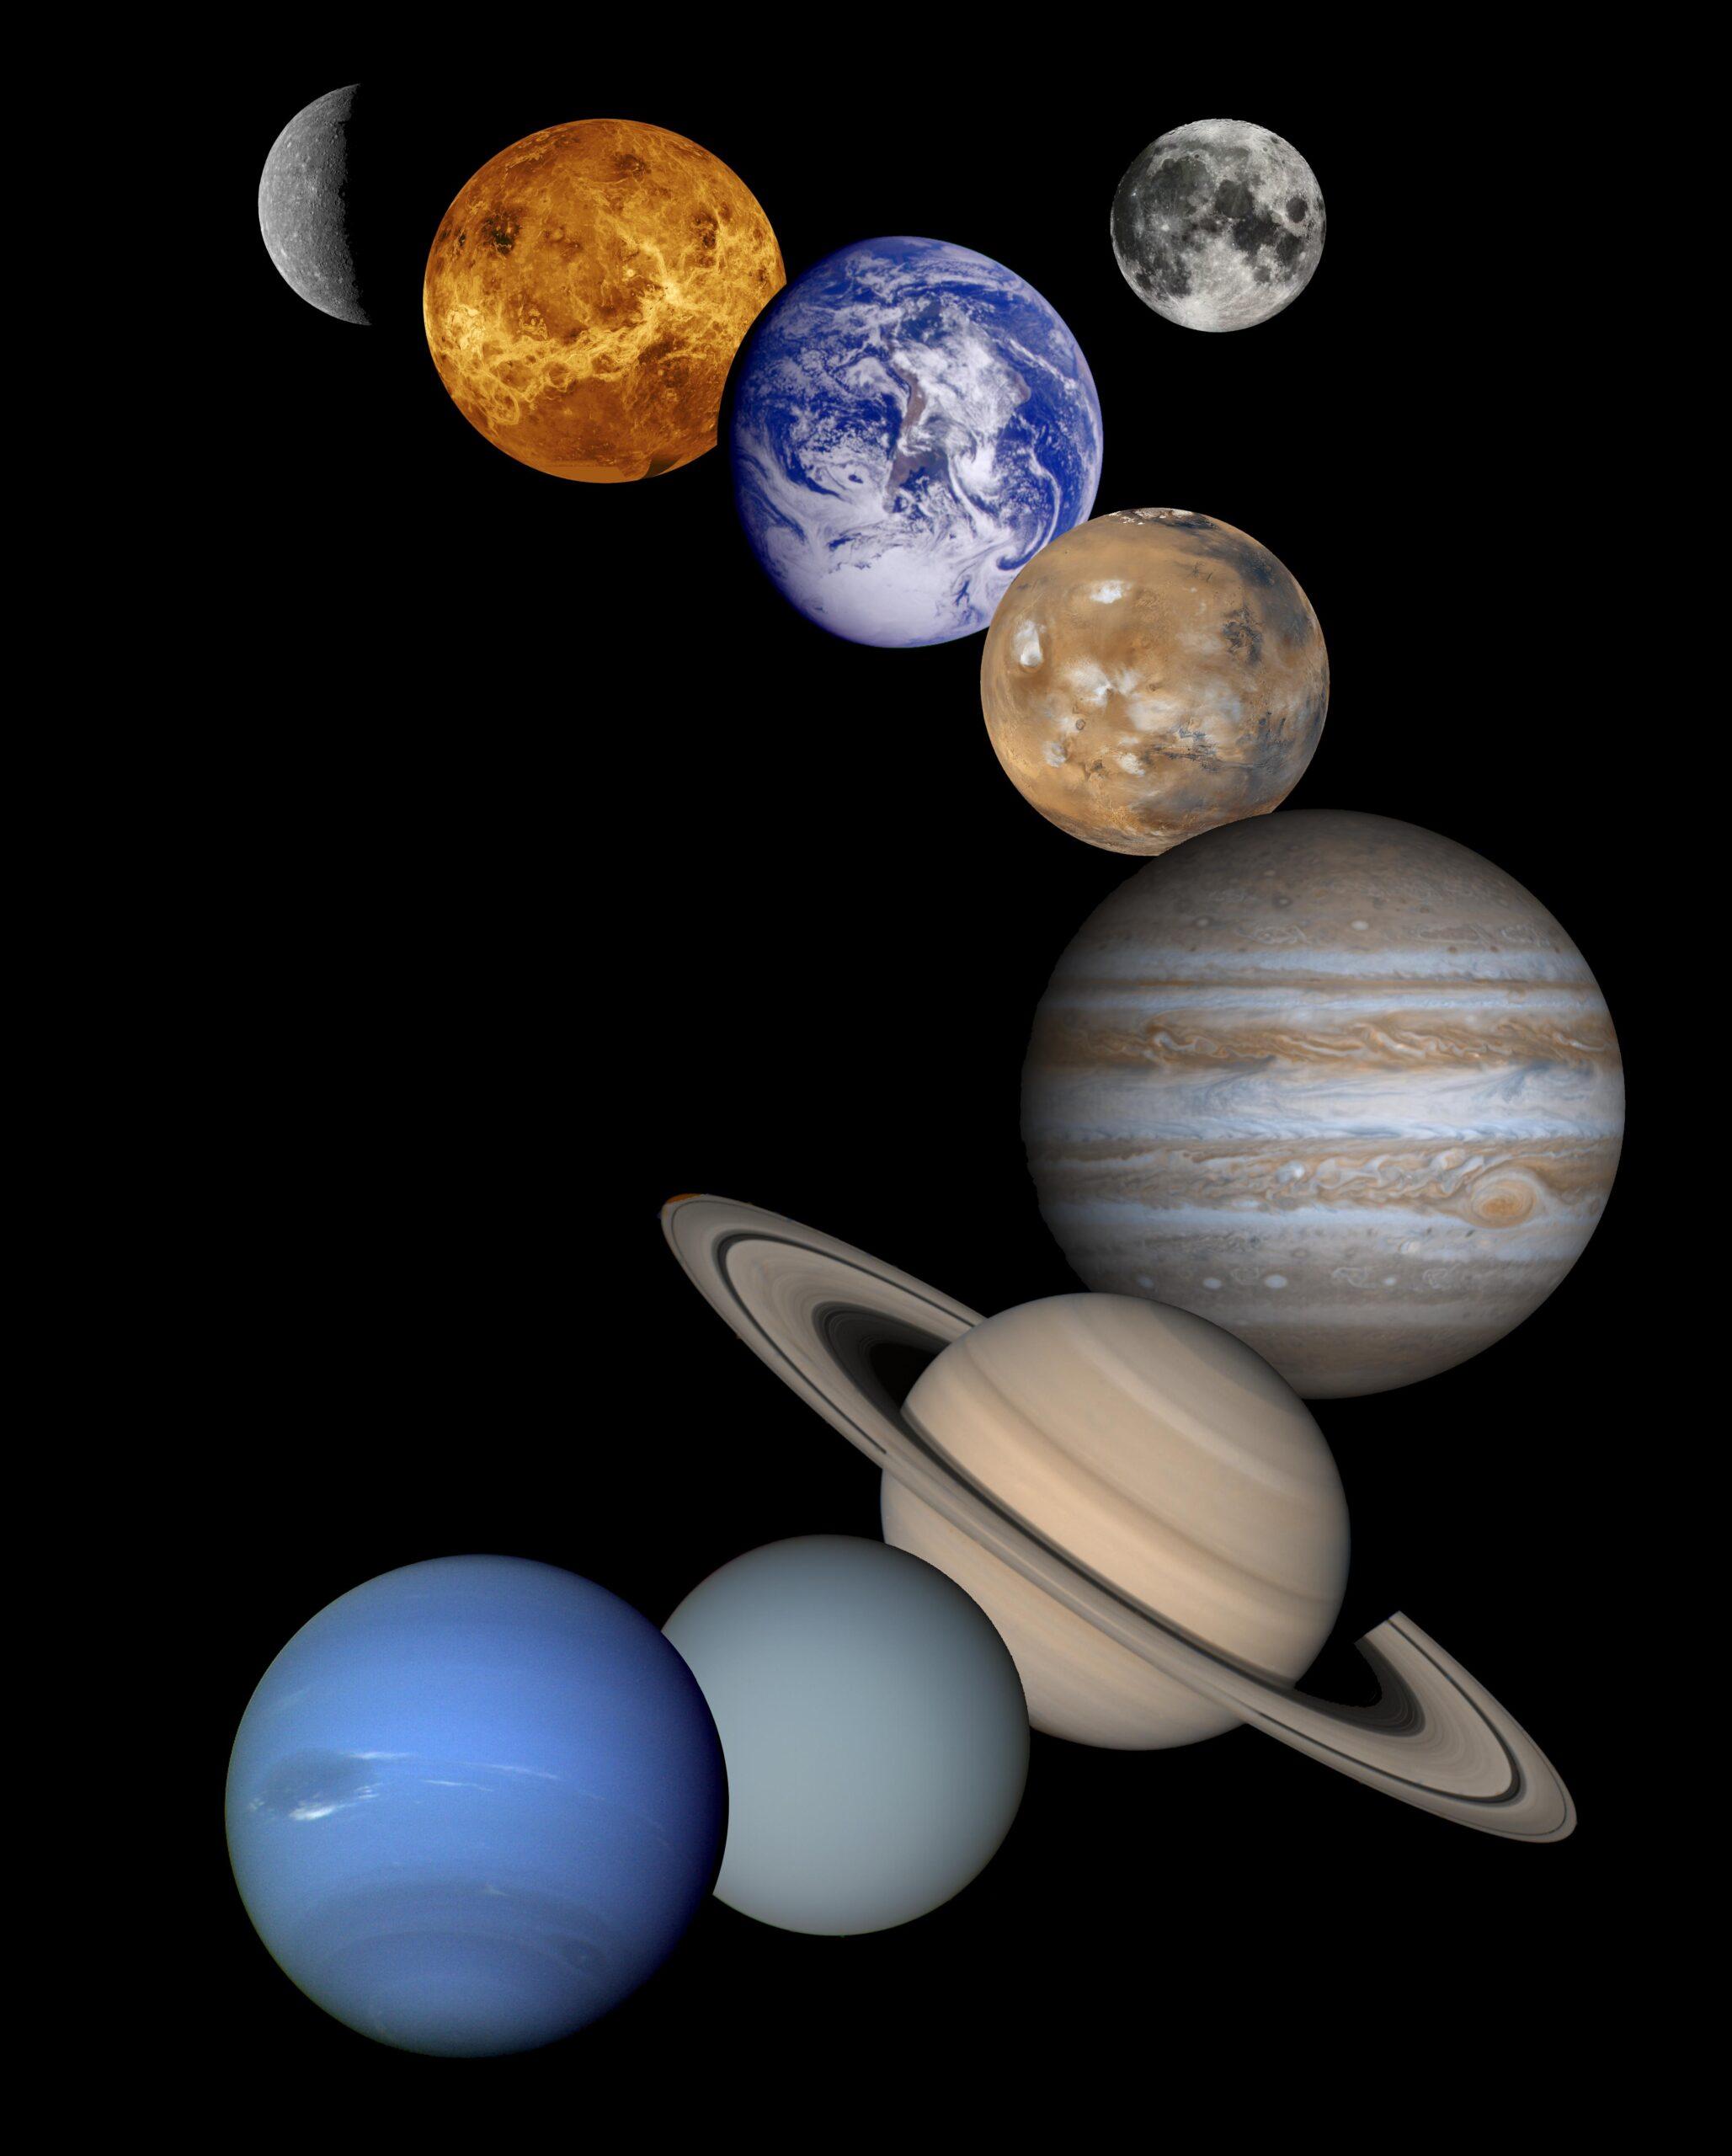 Menestra de planetas